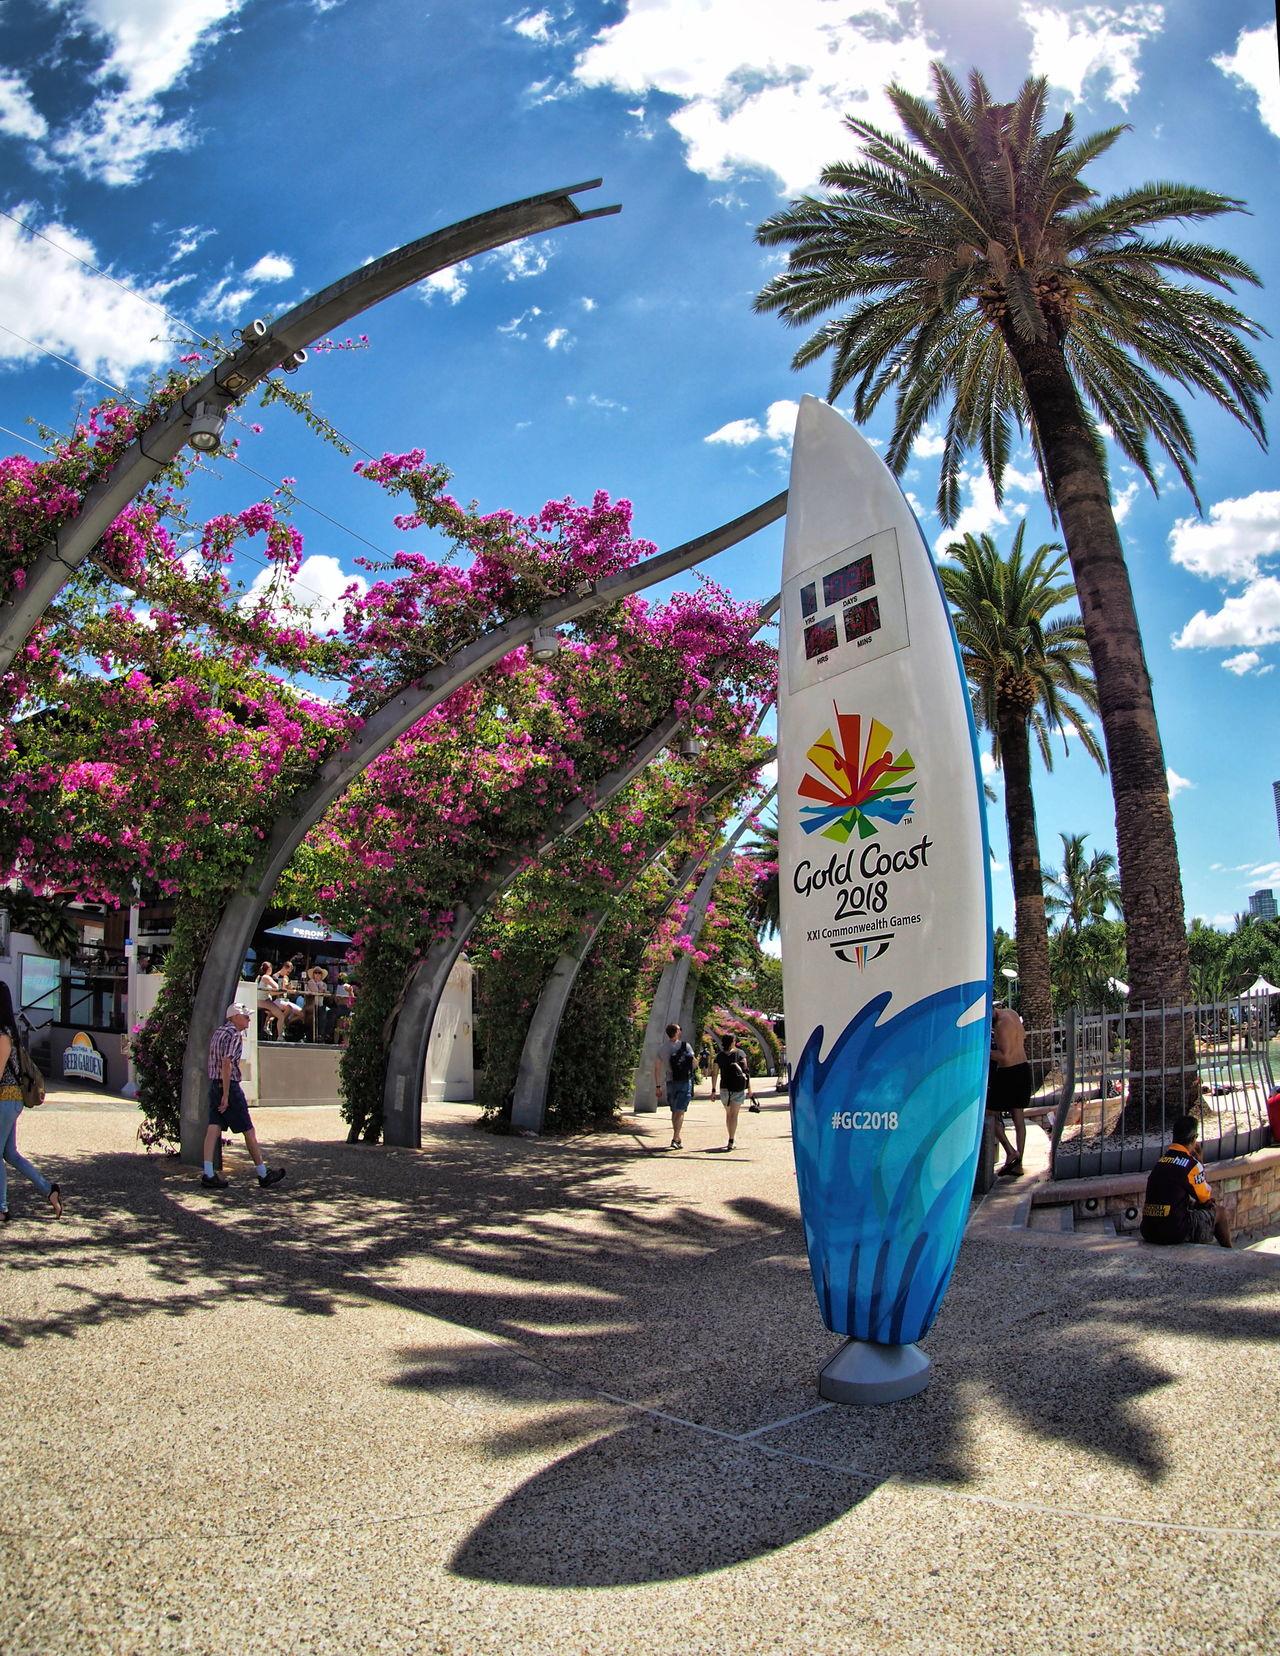 Australia Beauty In Nature Brisbane Brisbane Australia Day Fisheye Flowers Growth Nature No People Outdoors Paths Shadow Sunlight Tree